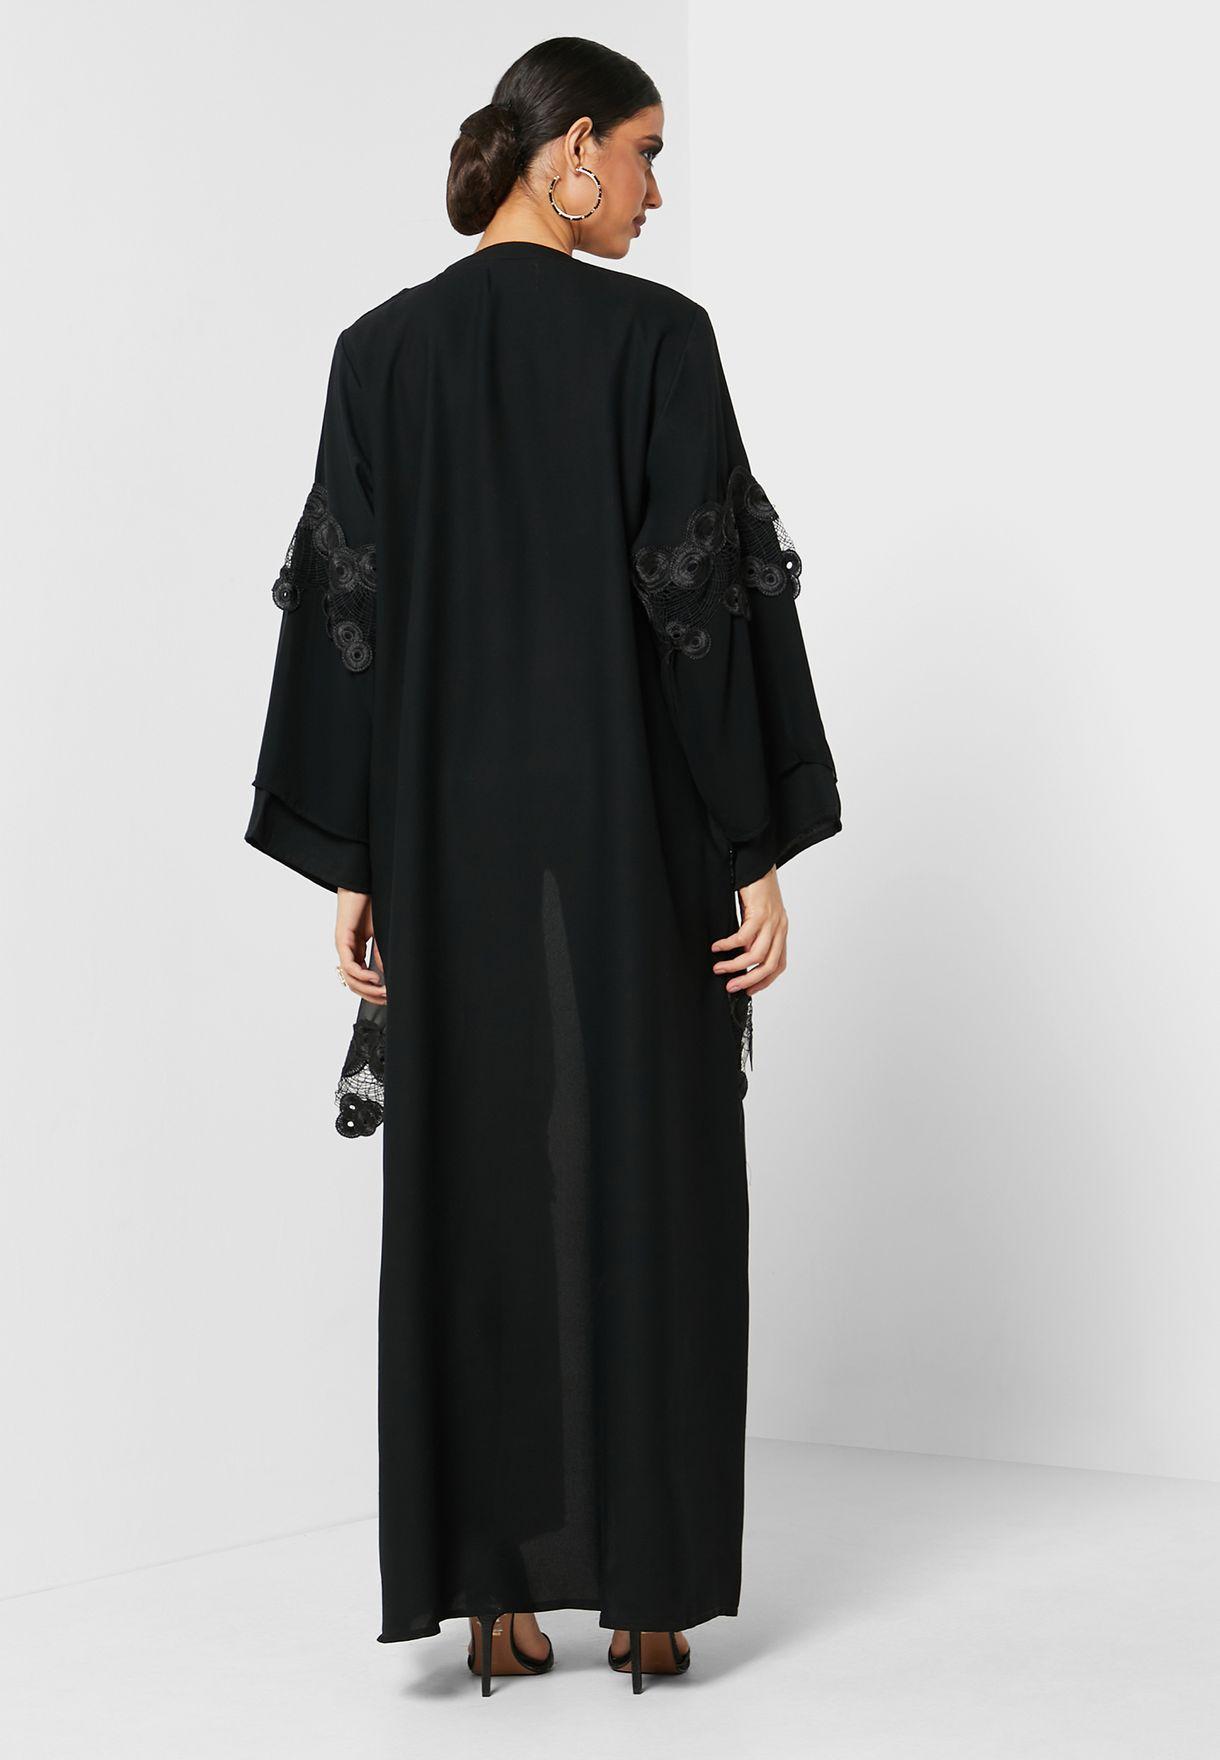 Pleated lace Detail Abaya